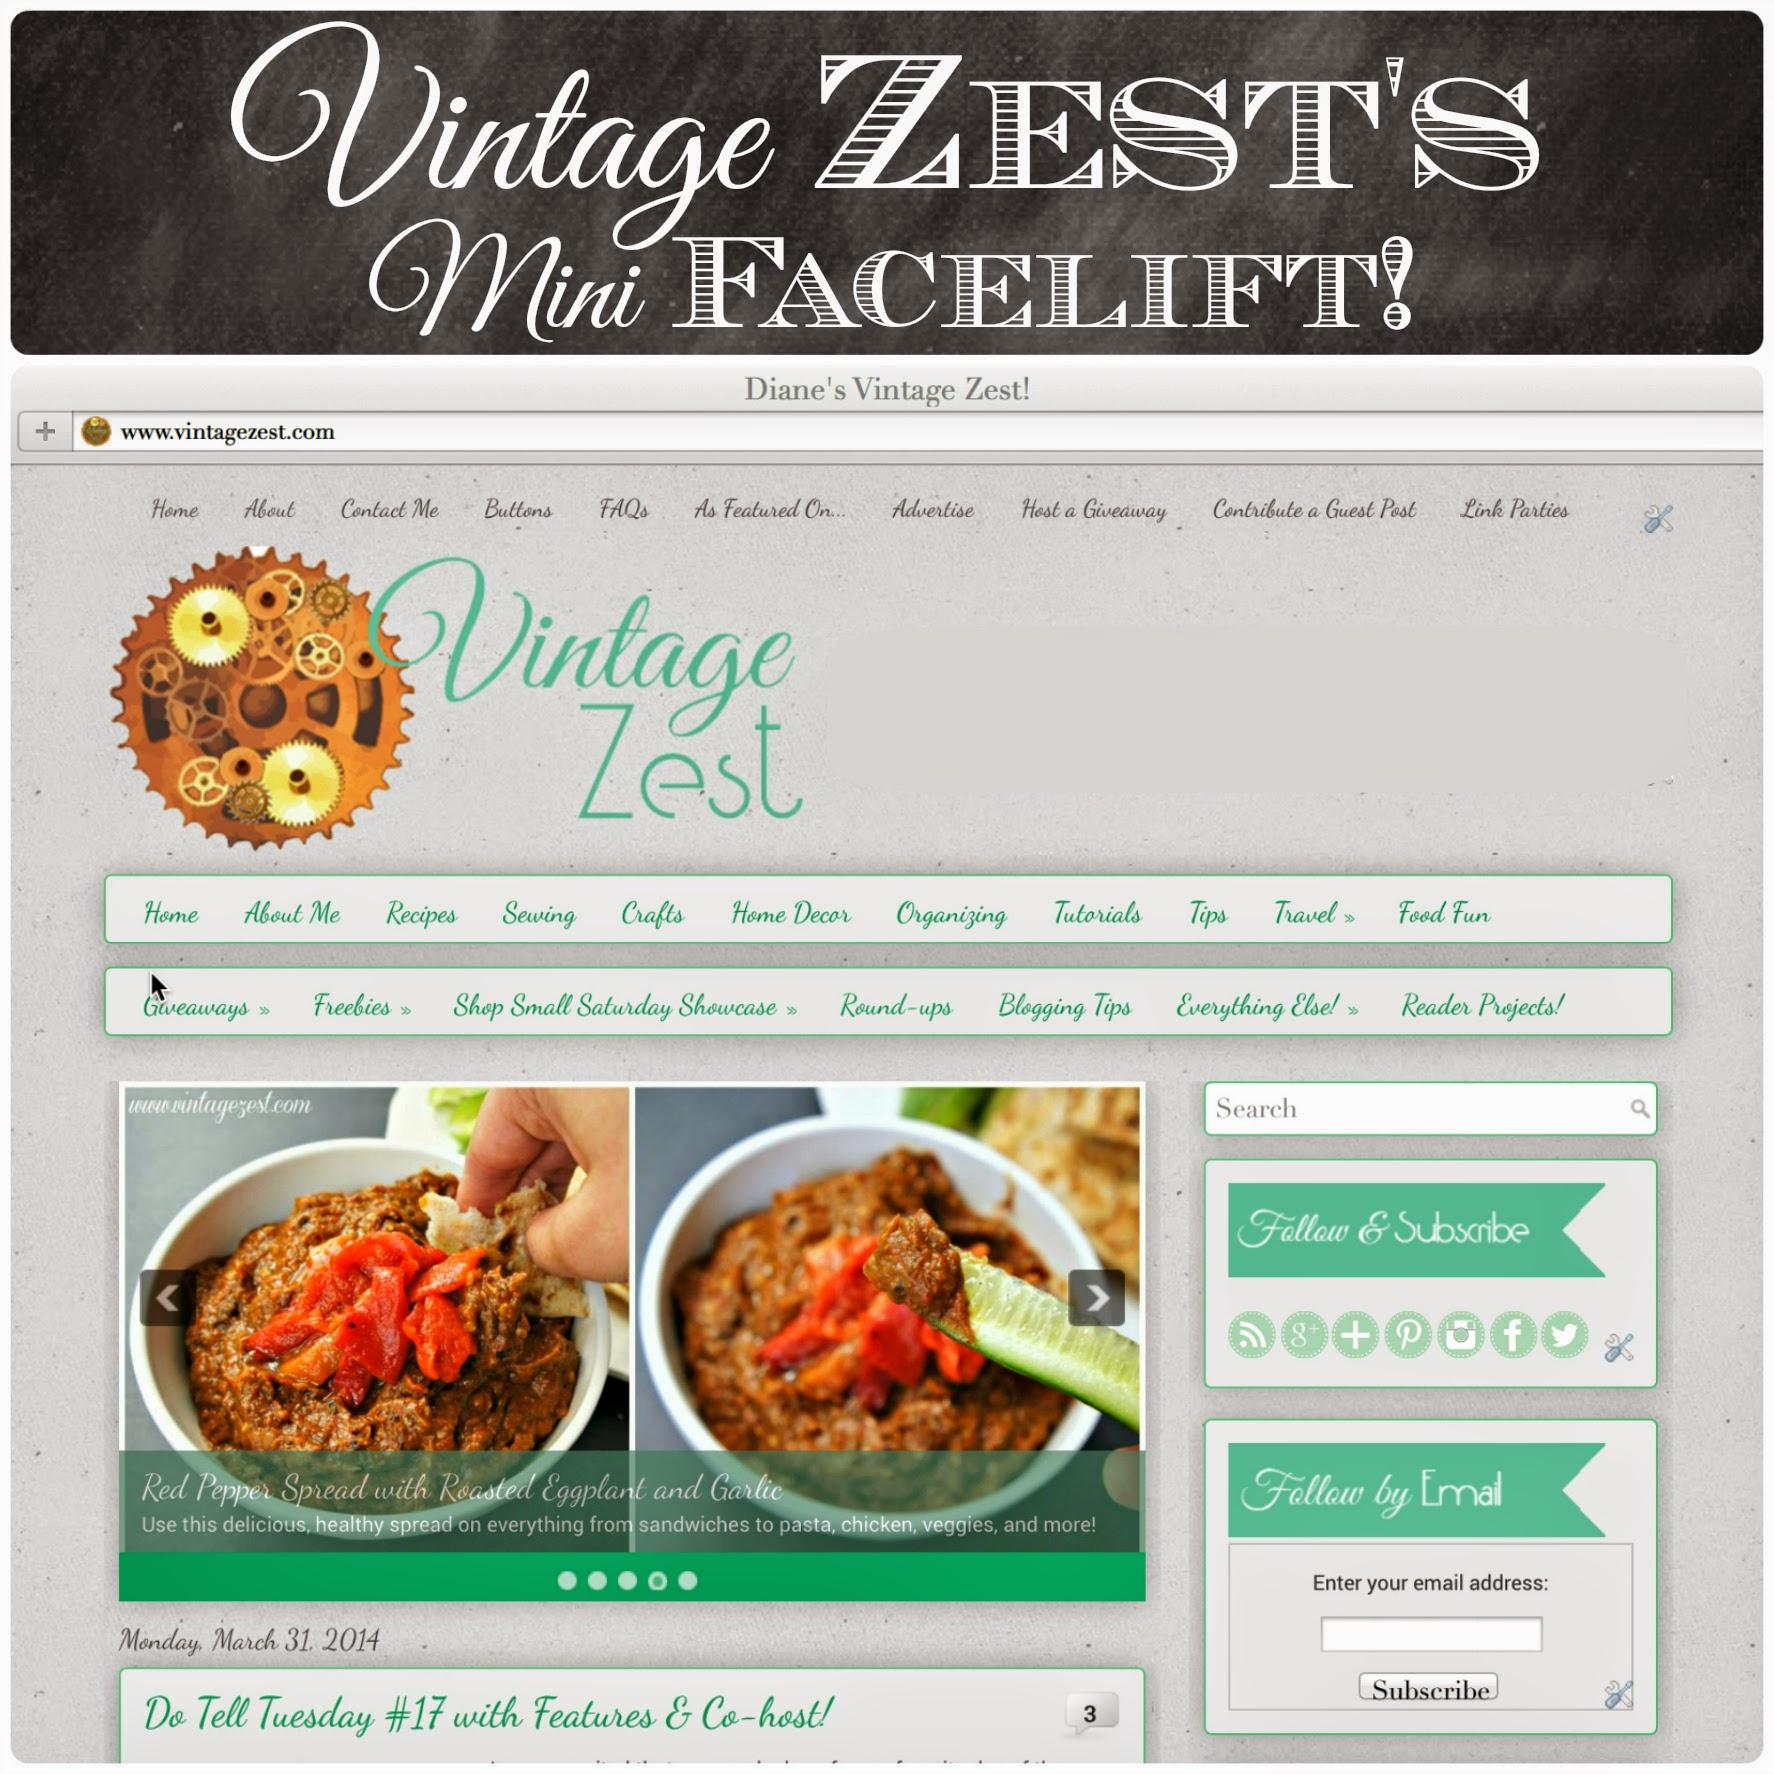 Vintage Zest's Mini Facelift! (a.k.a. My Blog Layout Redesign) on Diane's Vintage Zest!